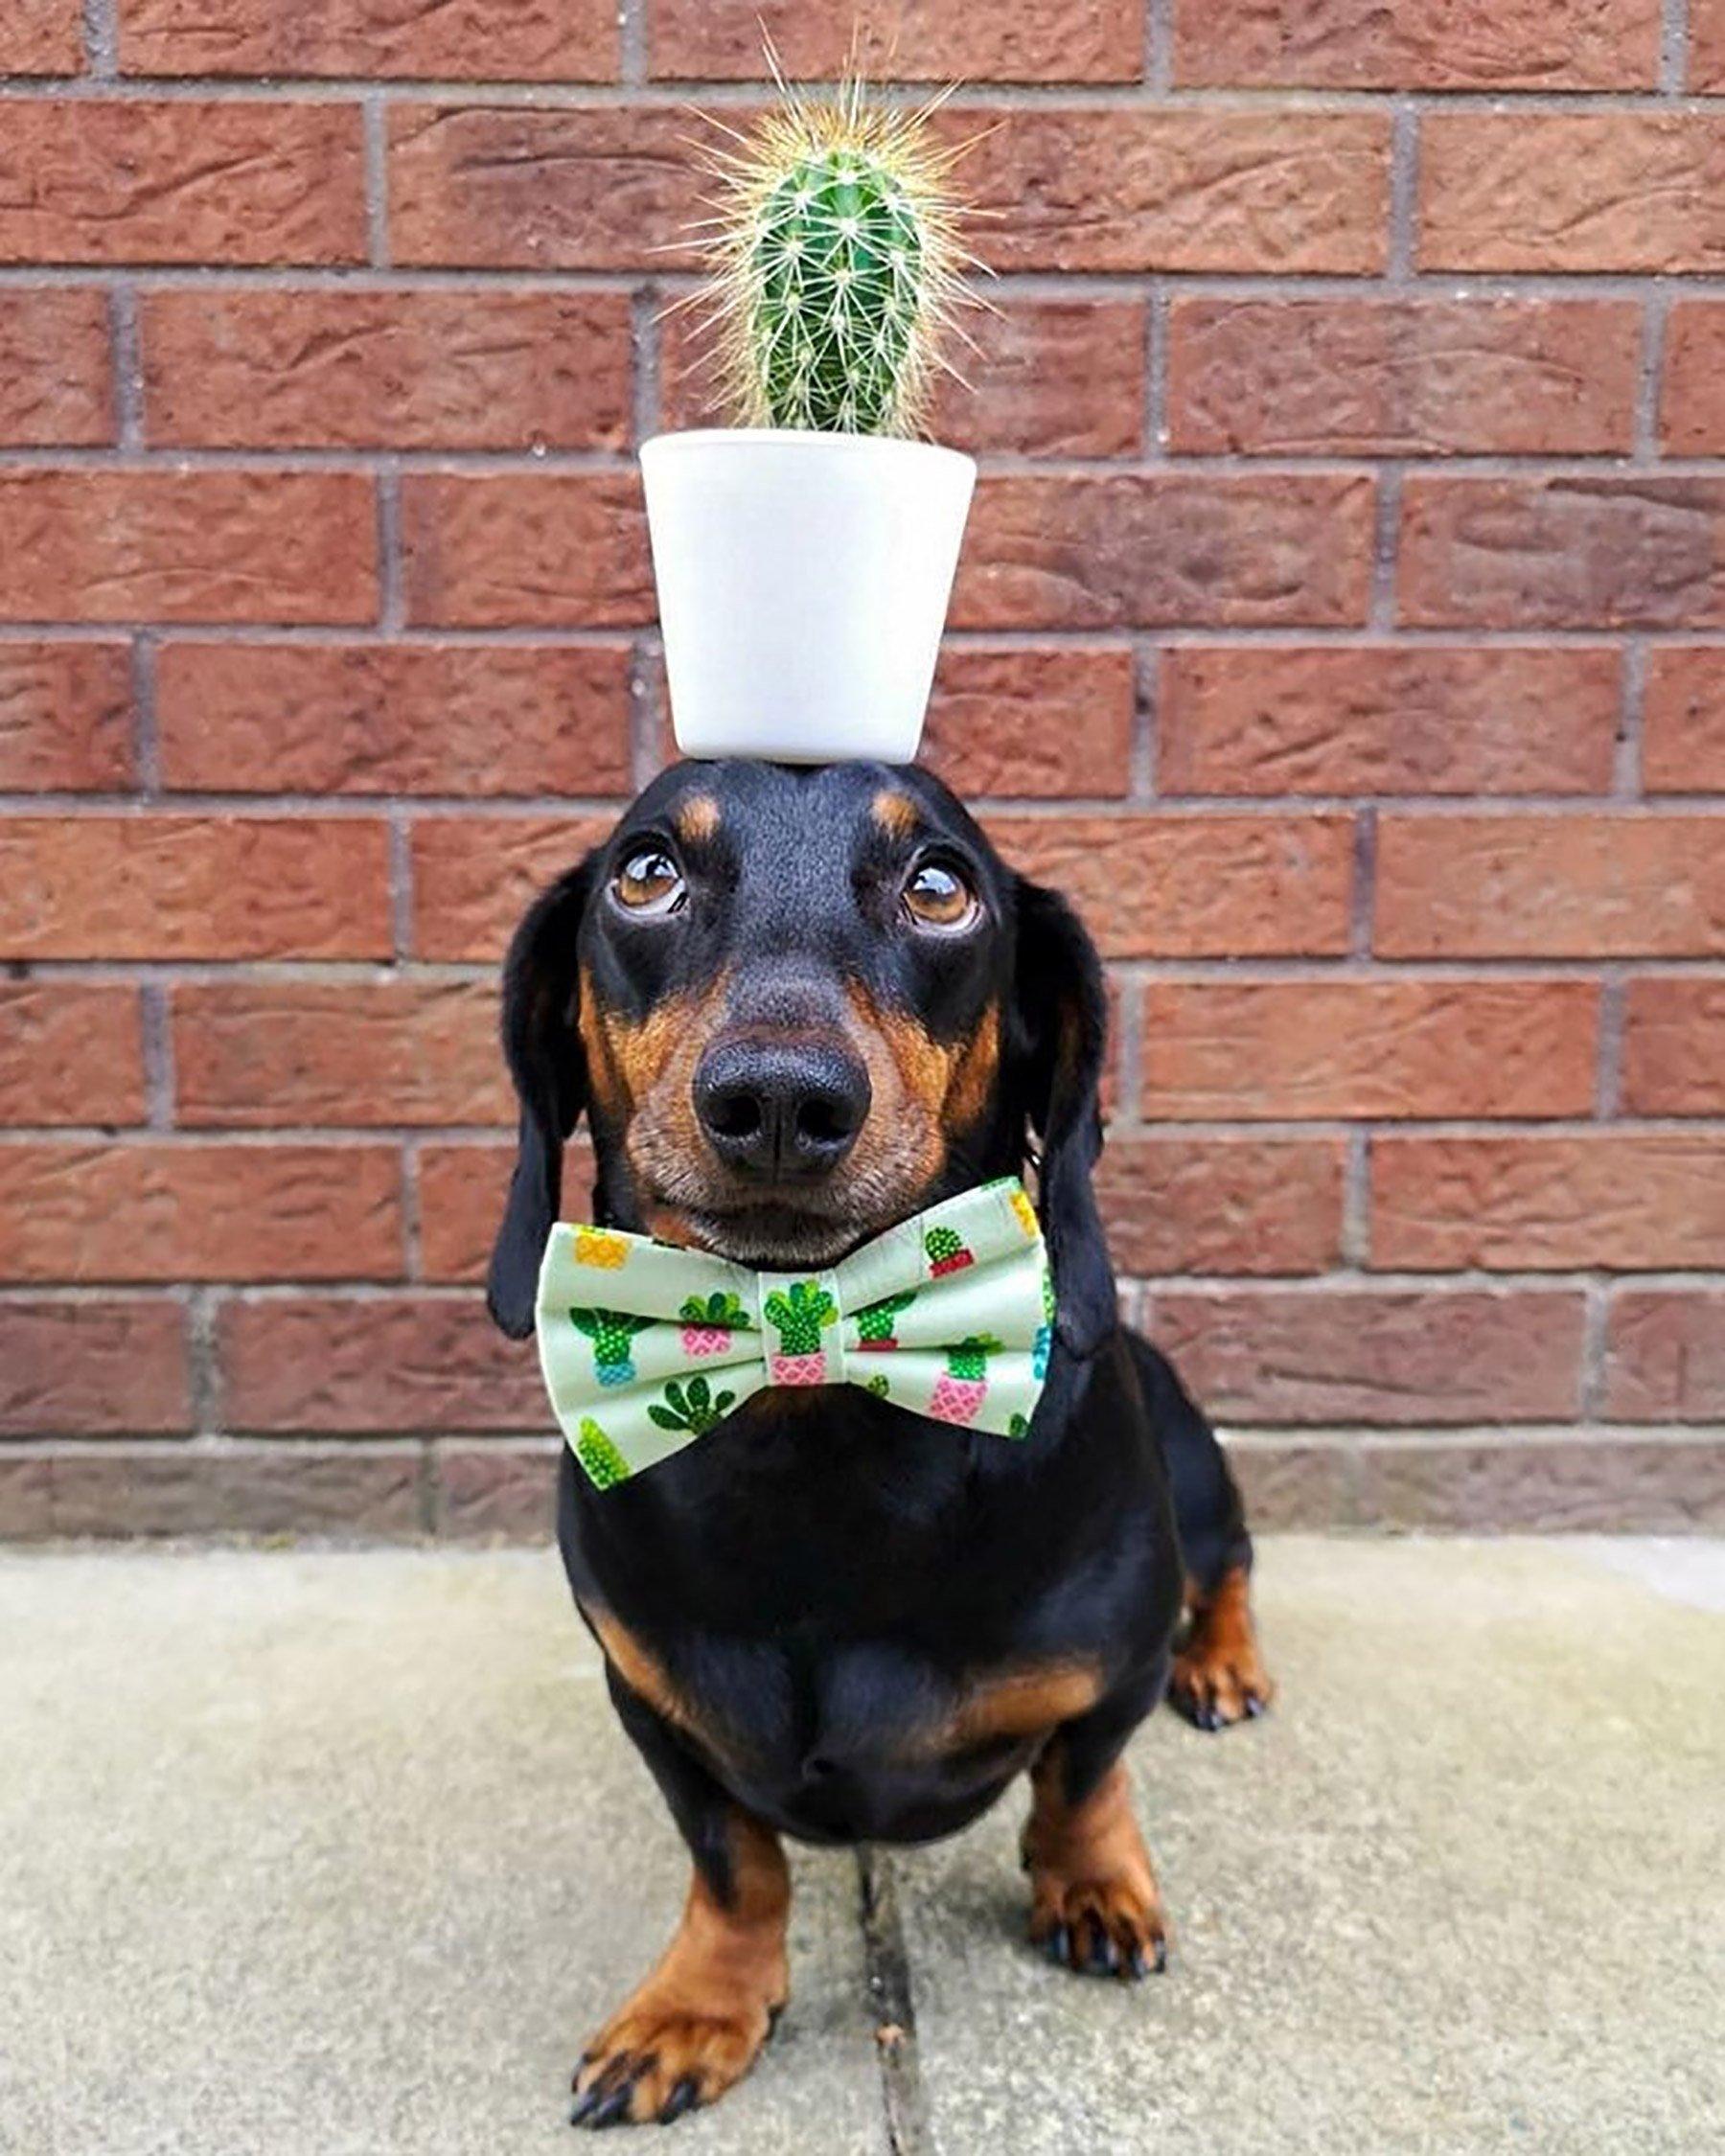 dog can balance items on his head